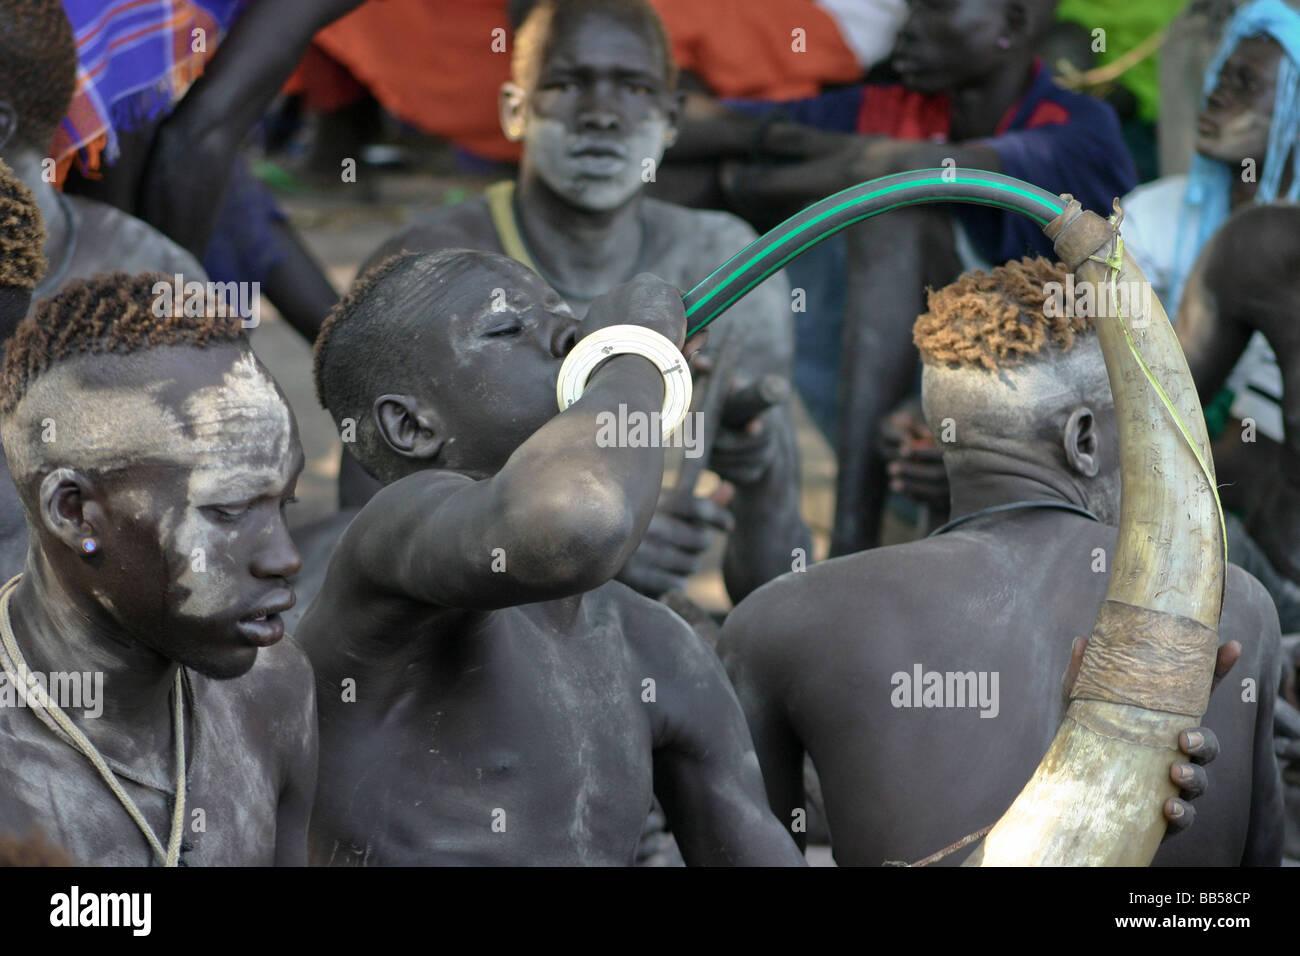 Akot, South Sudan: November 15, 2005.  Dinka youth from a cattle camp near Akot, South Sudan sing and make music. - Stock Image